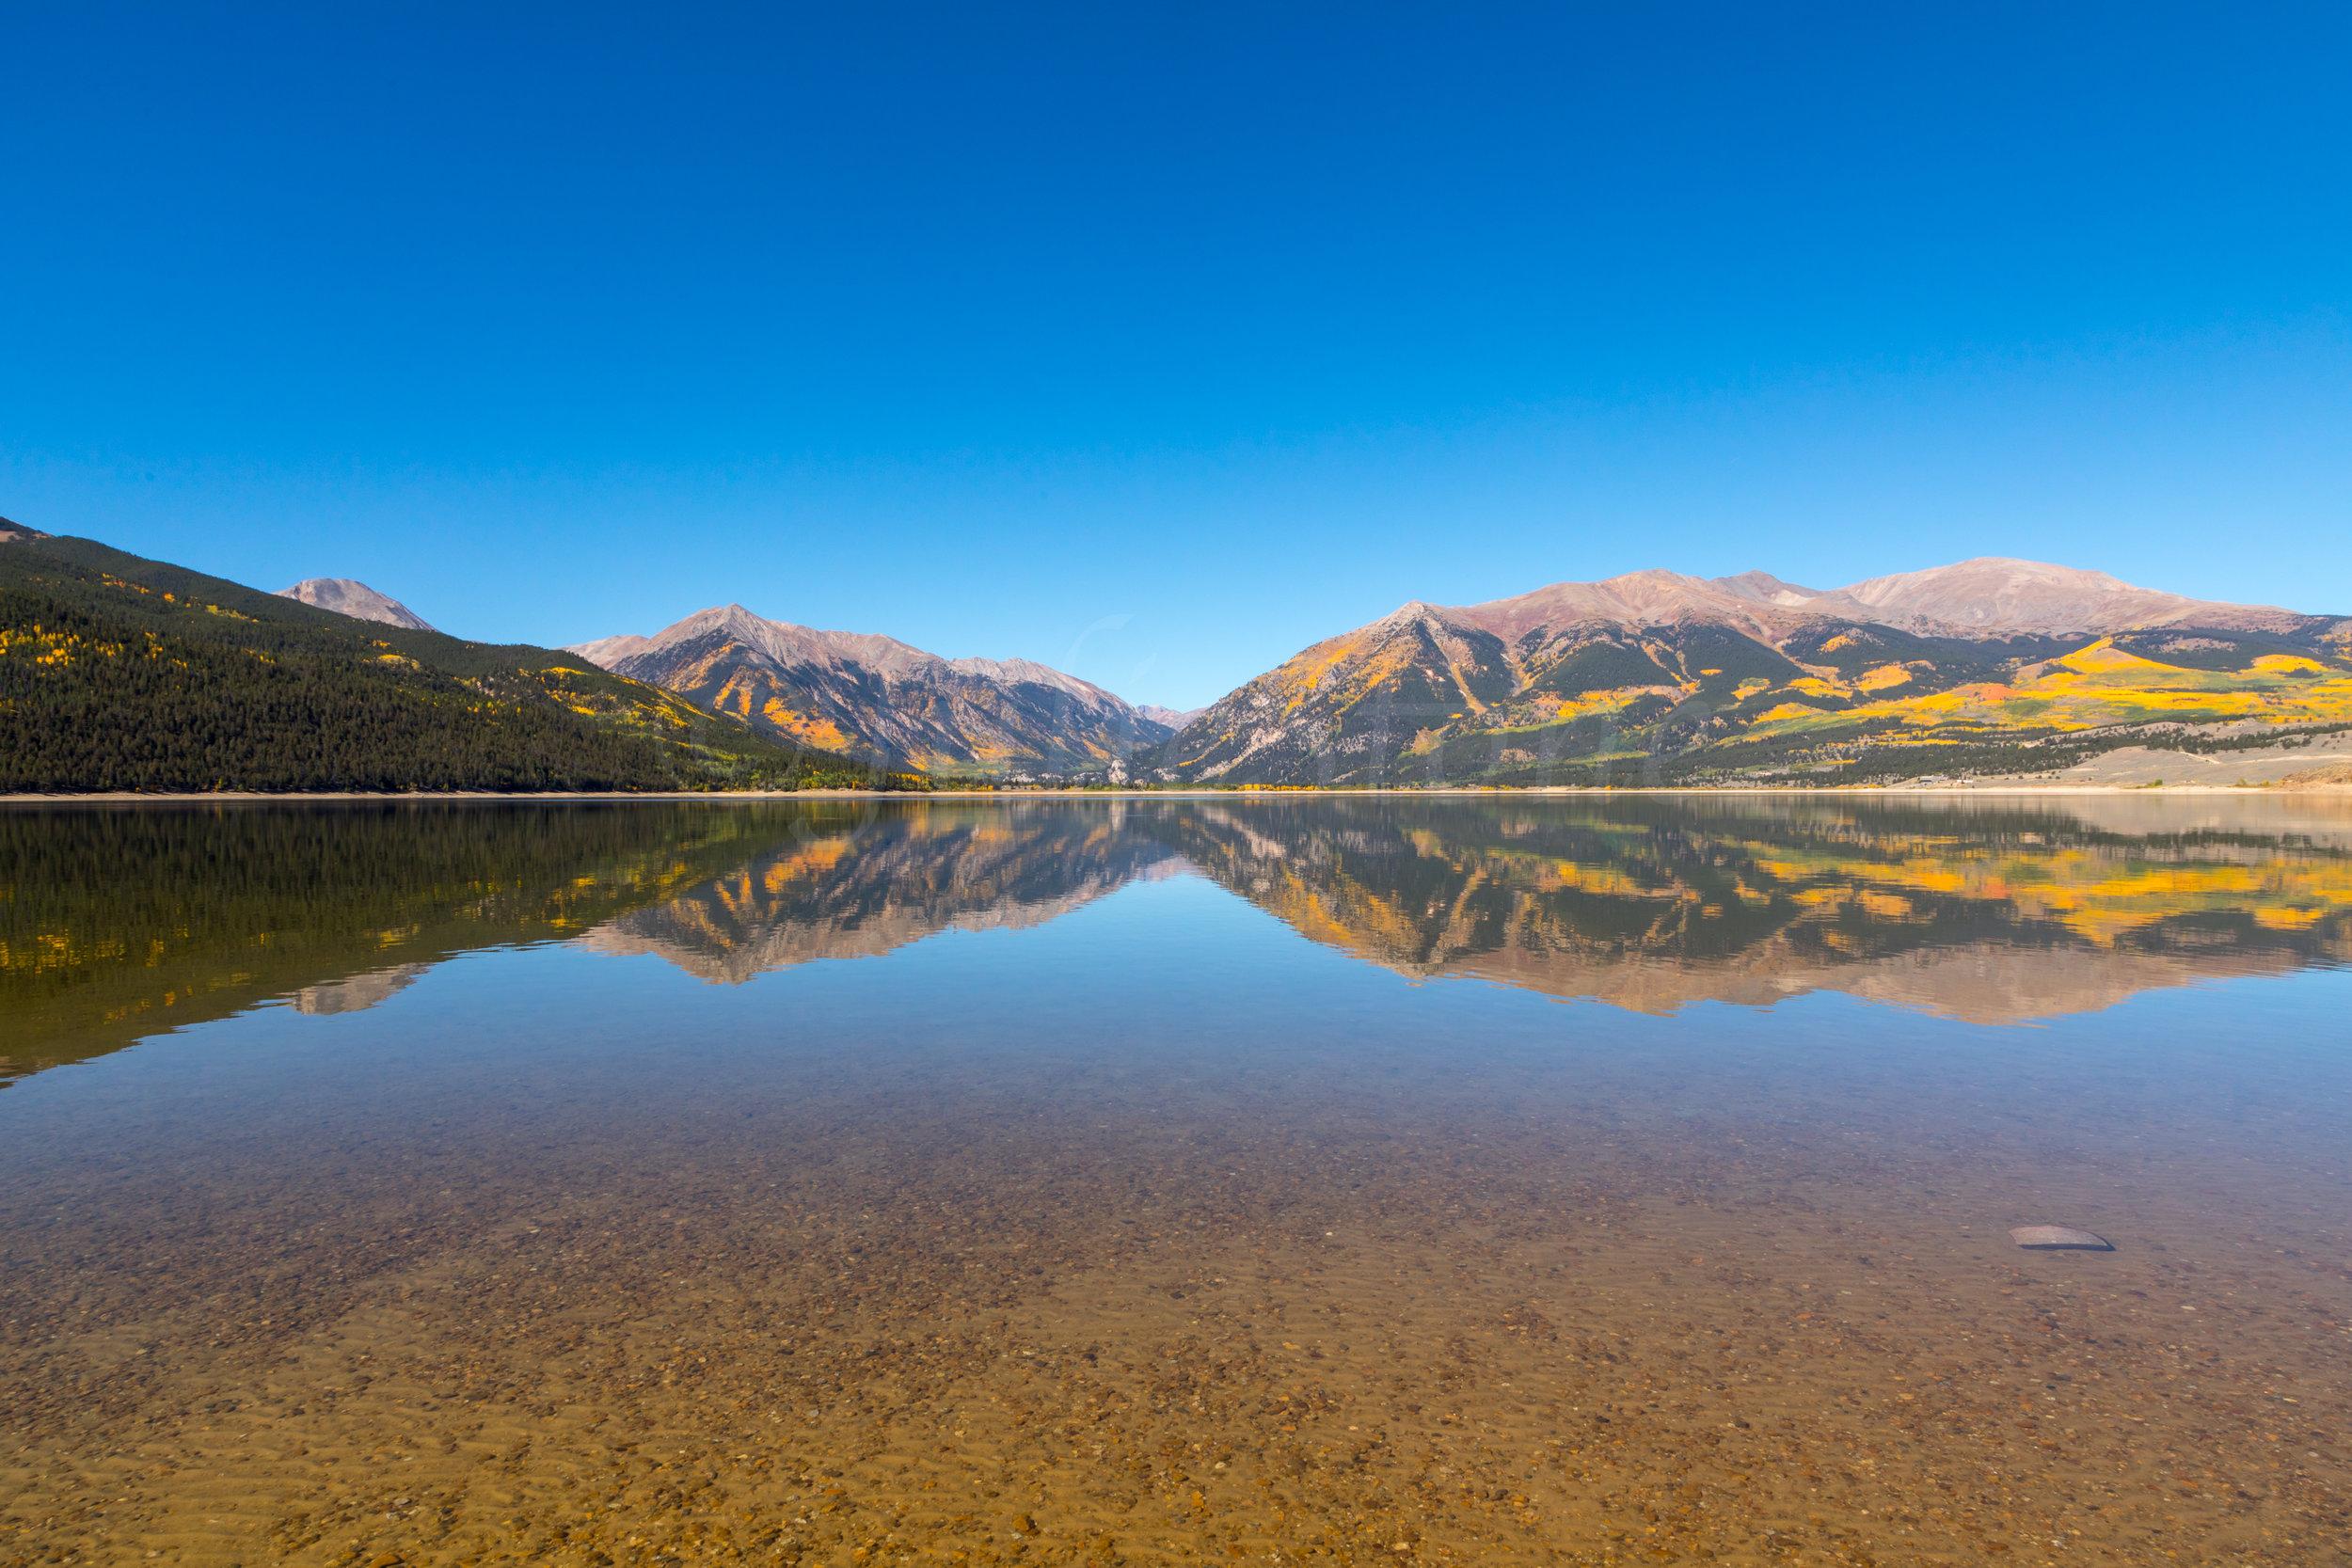 Twin Lakes, Image # 0406